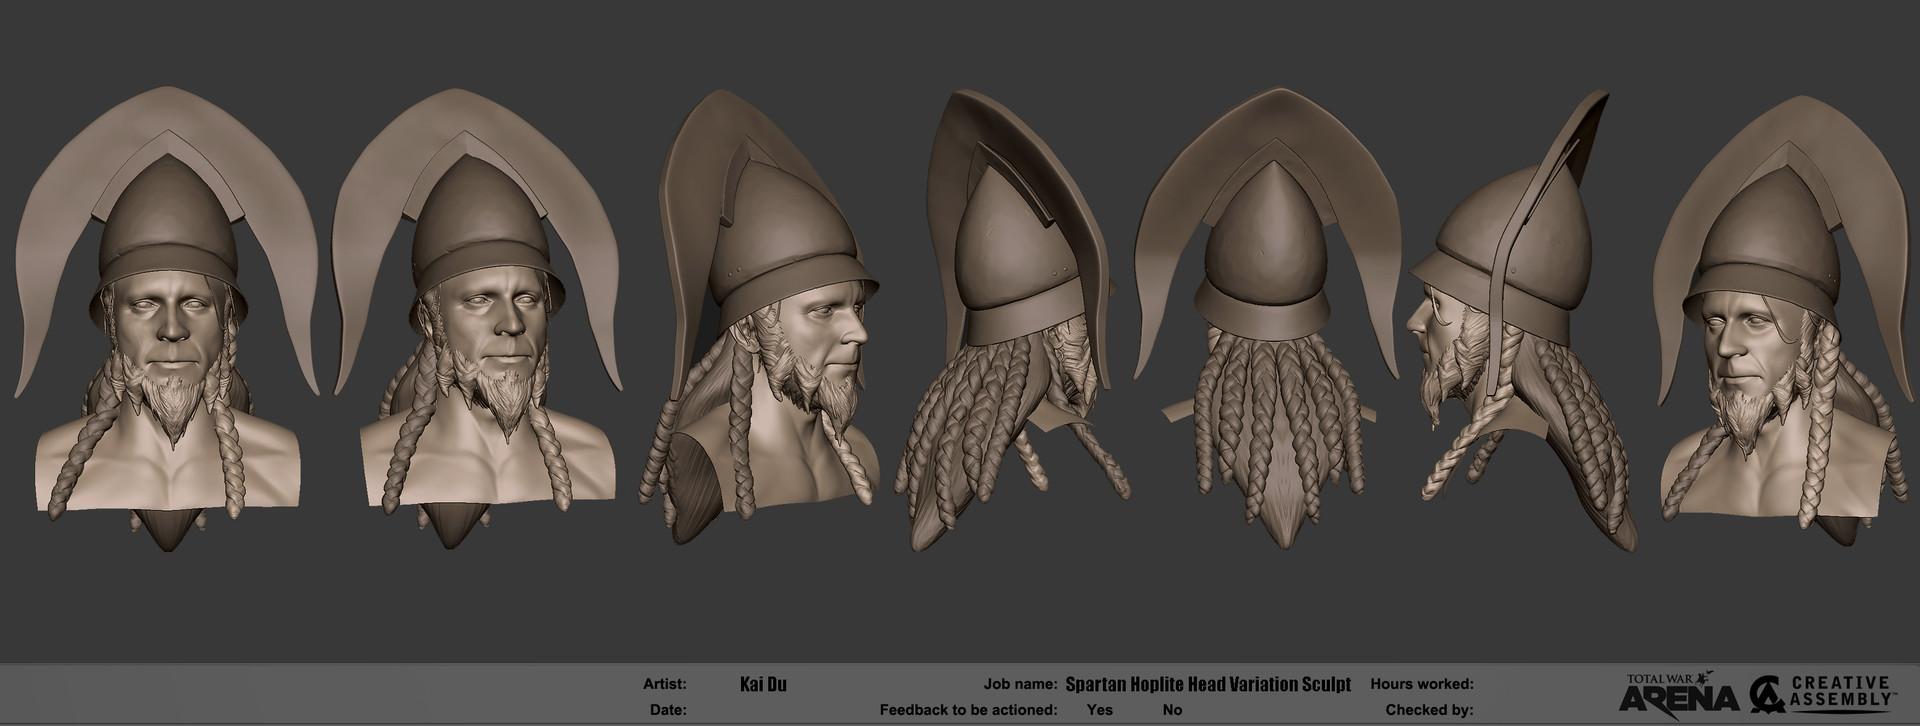 Kai du kai du spartan hoplite hex variation sculpt